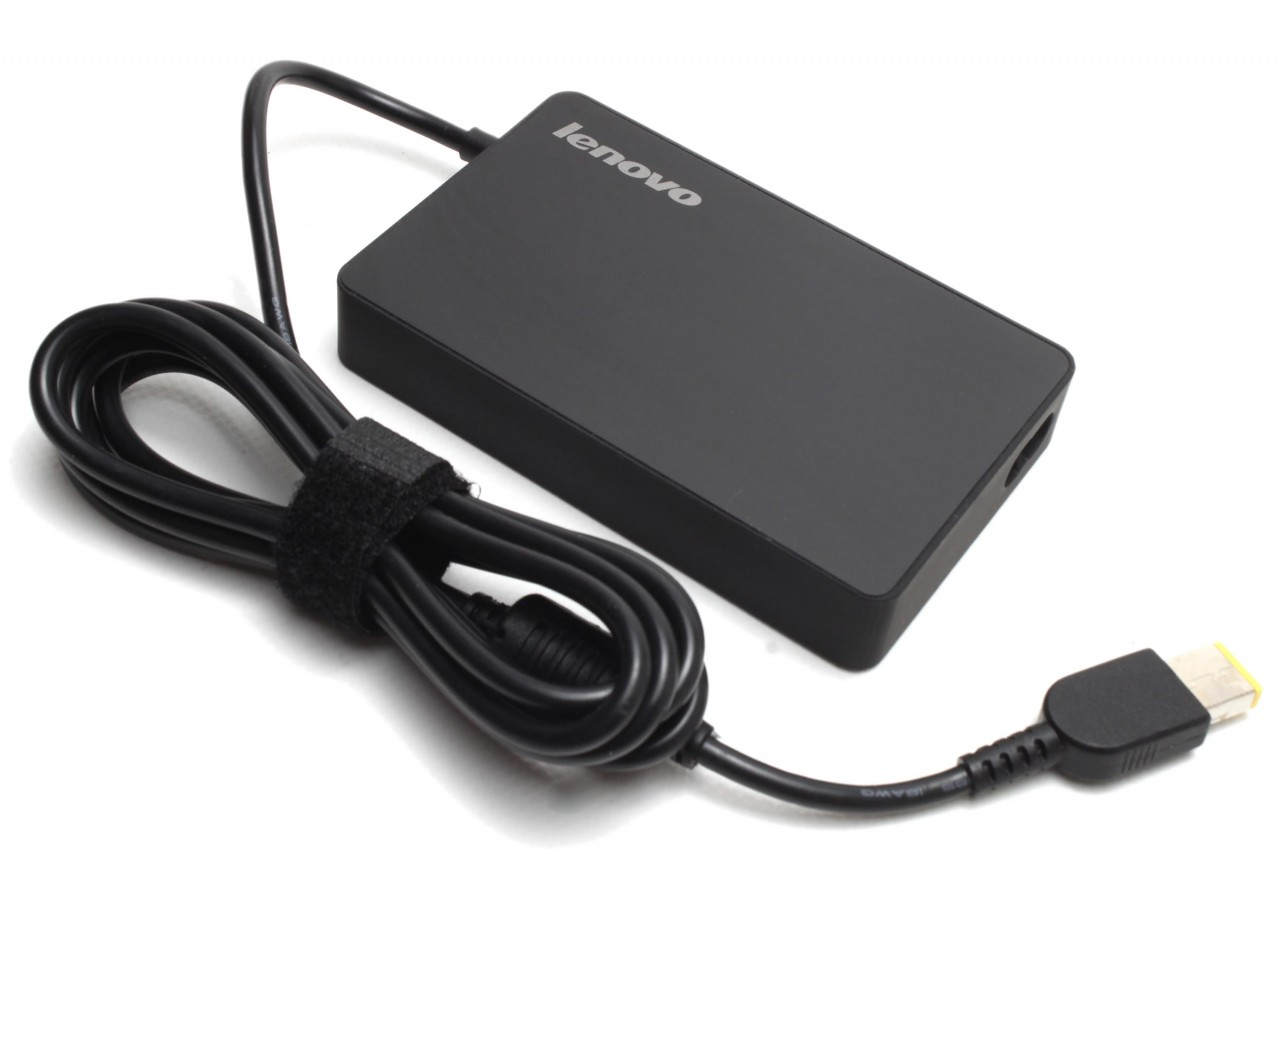 Incarcator Lenovo ThinkPad L540 20AV 65W Slim Version imagine